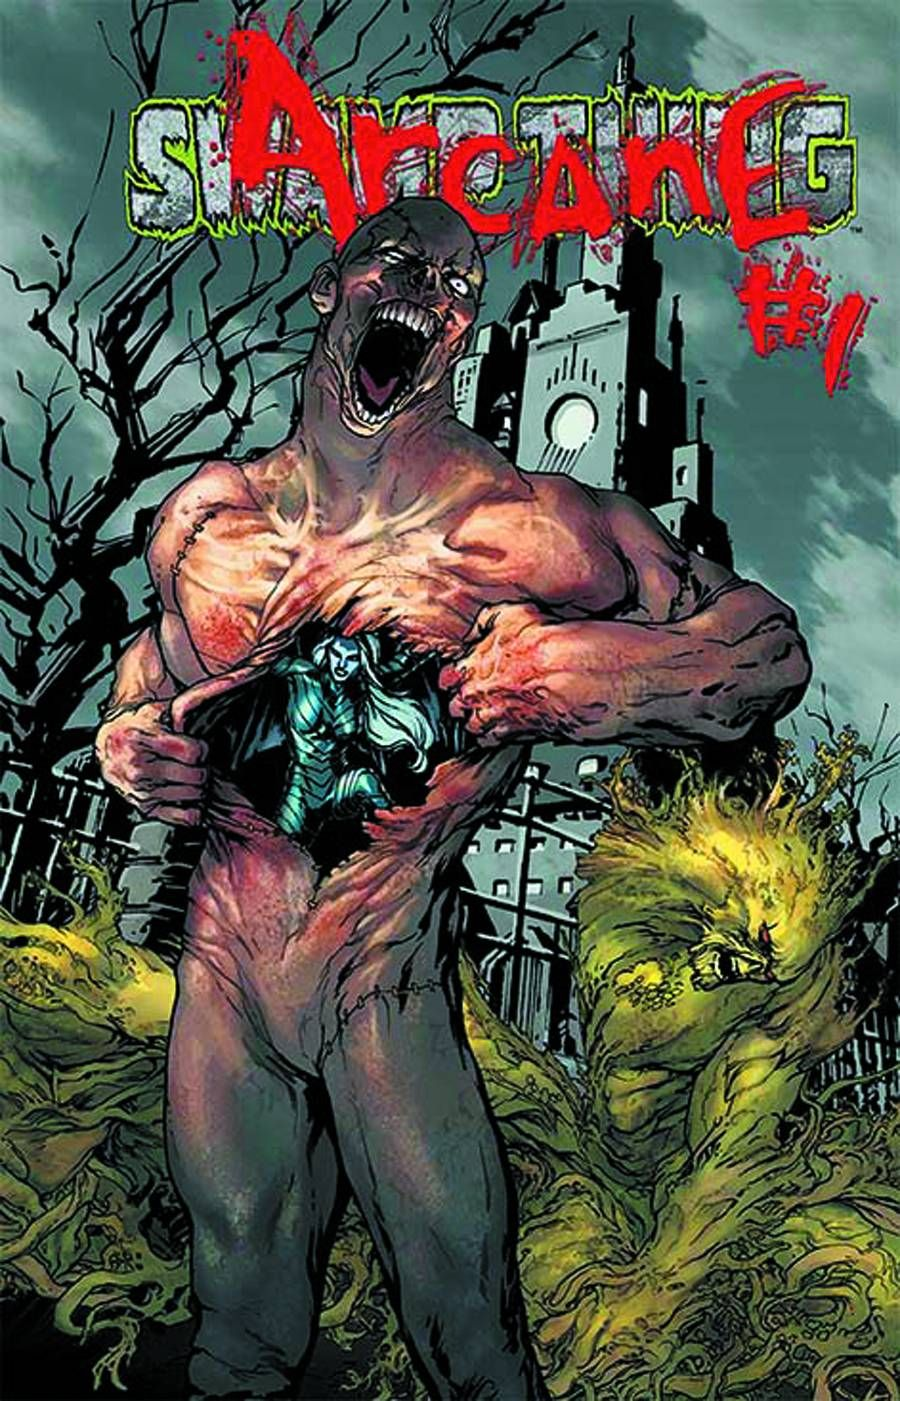 Swamp Thing - Arcane #23.1 (Virgin Cover) #SwampThing #New52 #DC (Cover Artist: Jesus Saiz) On Sale: 9/18/2013